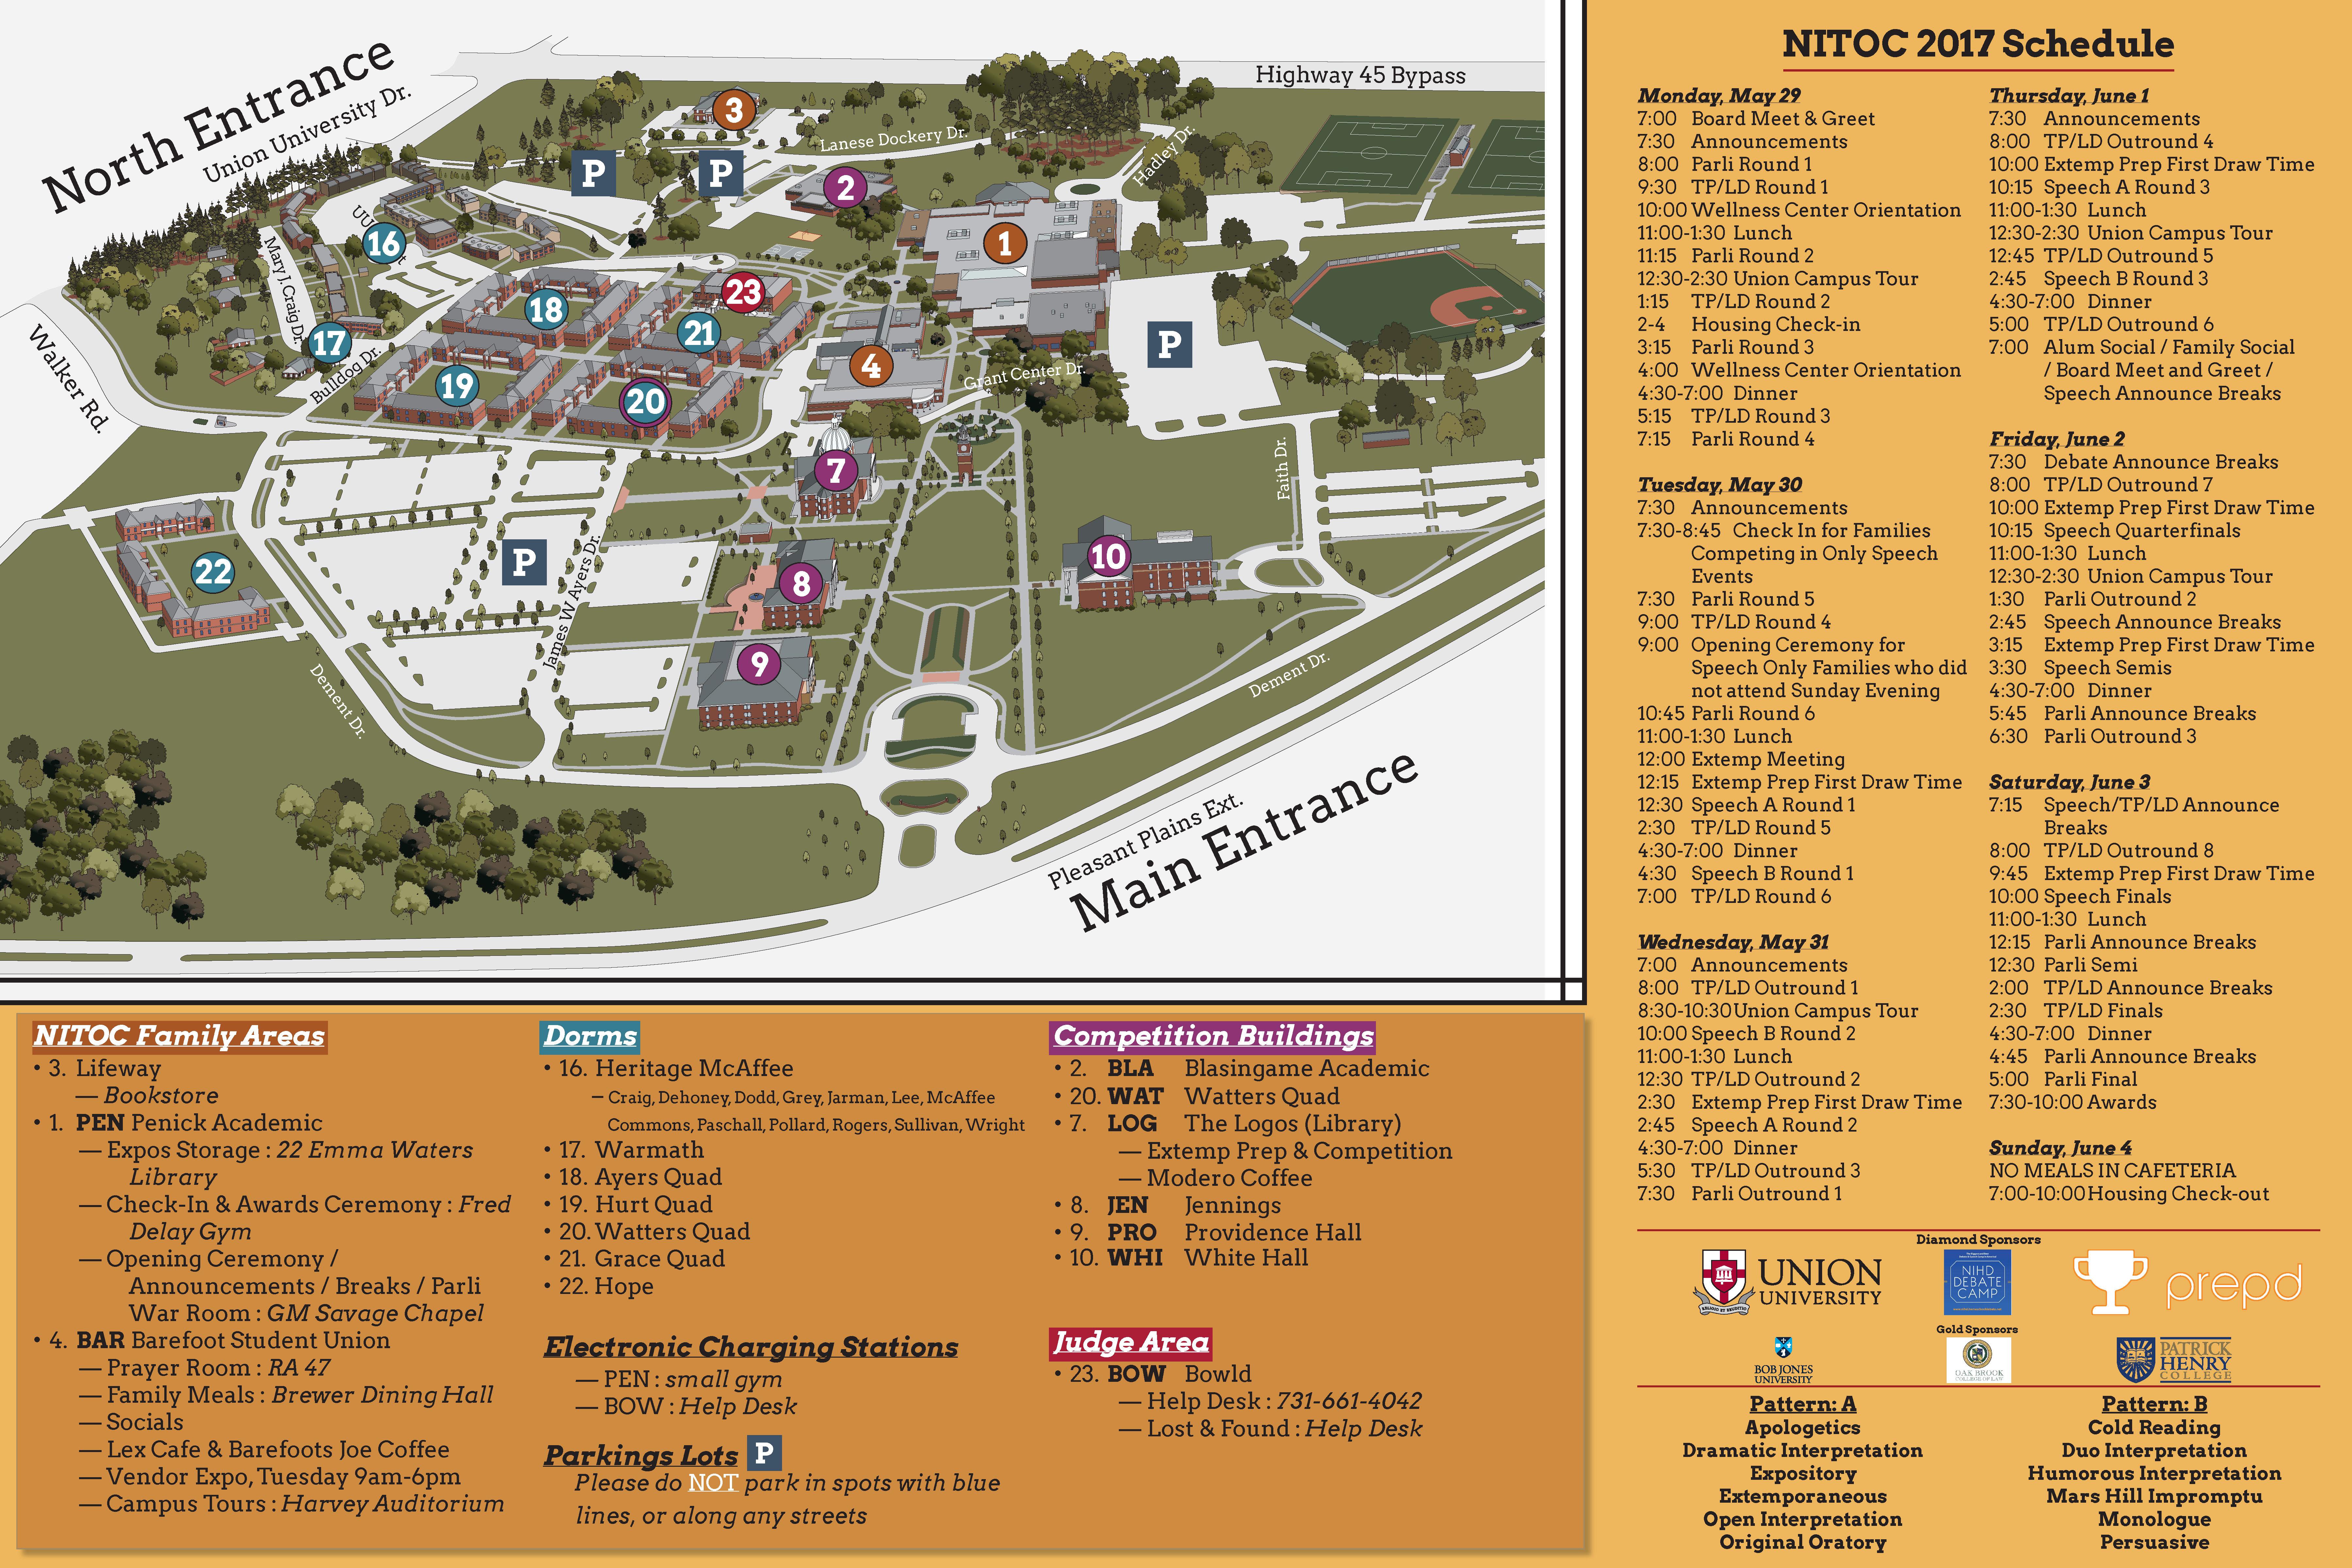 Oc Campus Map.Nitoc 2017